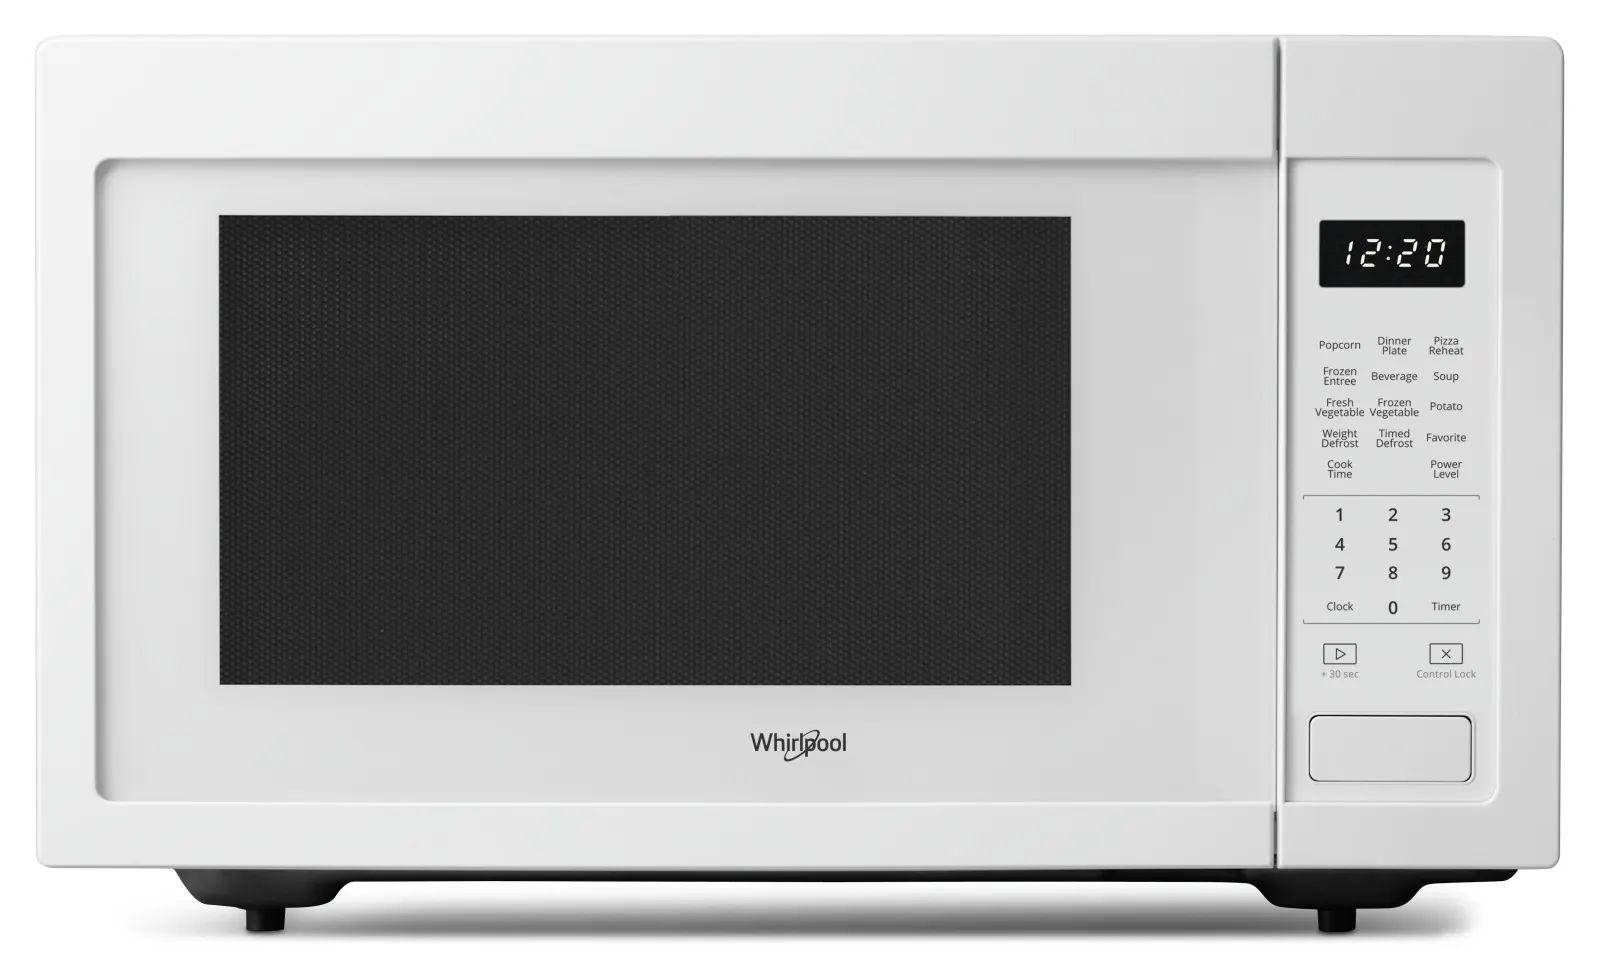 whirlpool 21 inch 1 6 cu ft 1100 watt countertop microwave in white ywmc30516hw